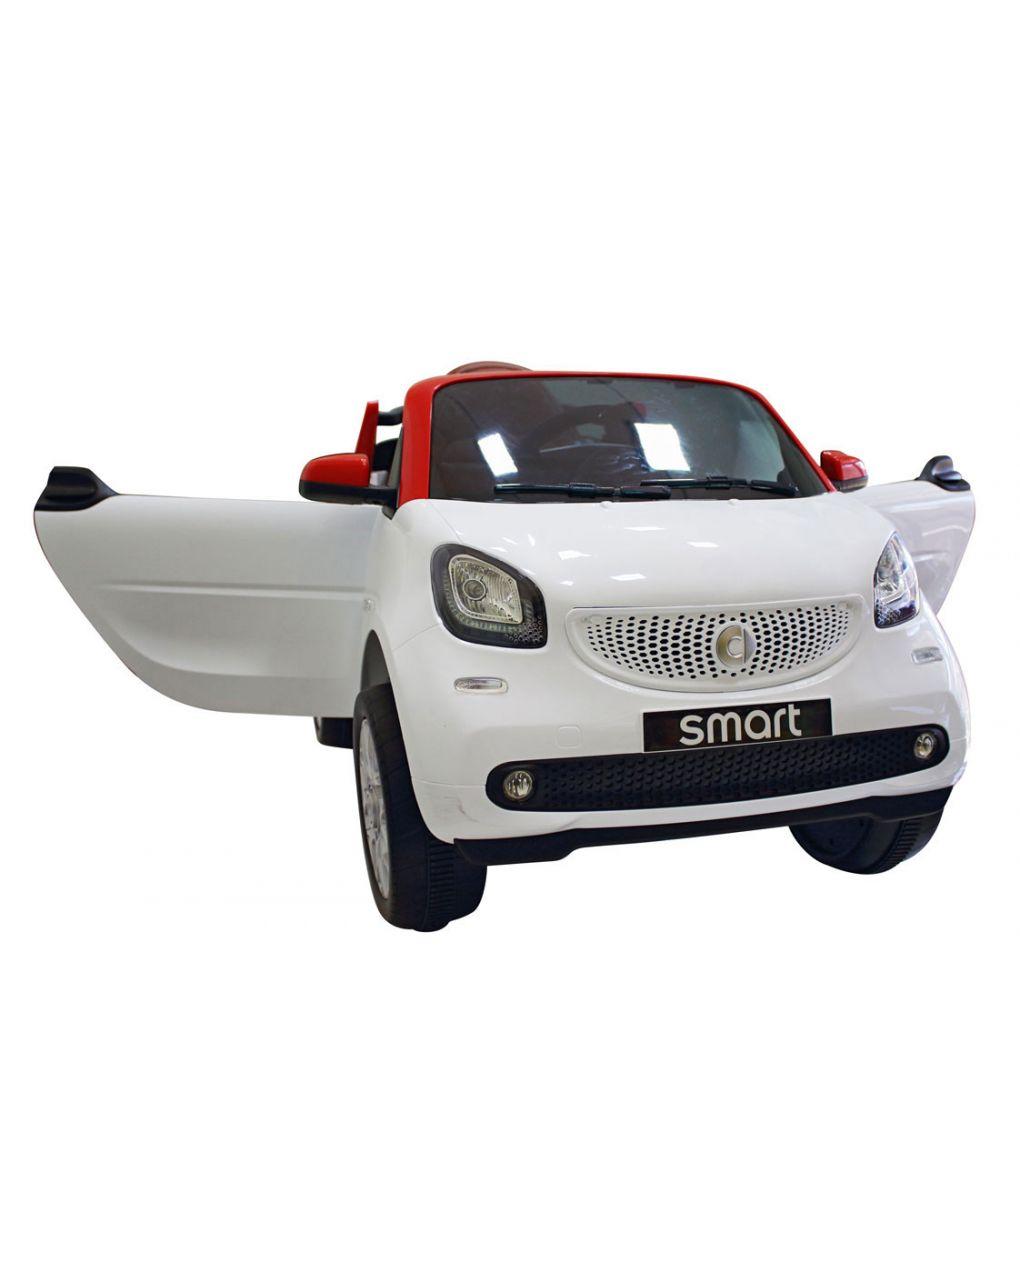 Smart bianca mp4 + ecopelle 12 volt - Giaquinto